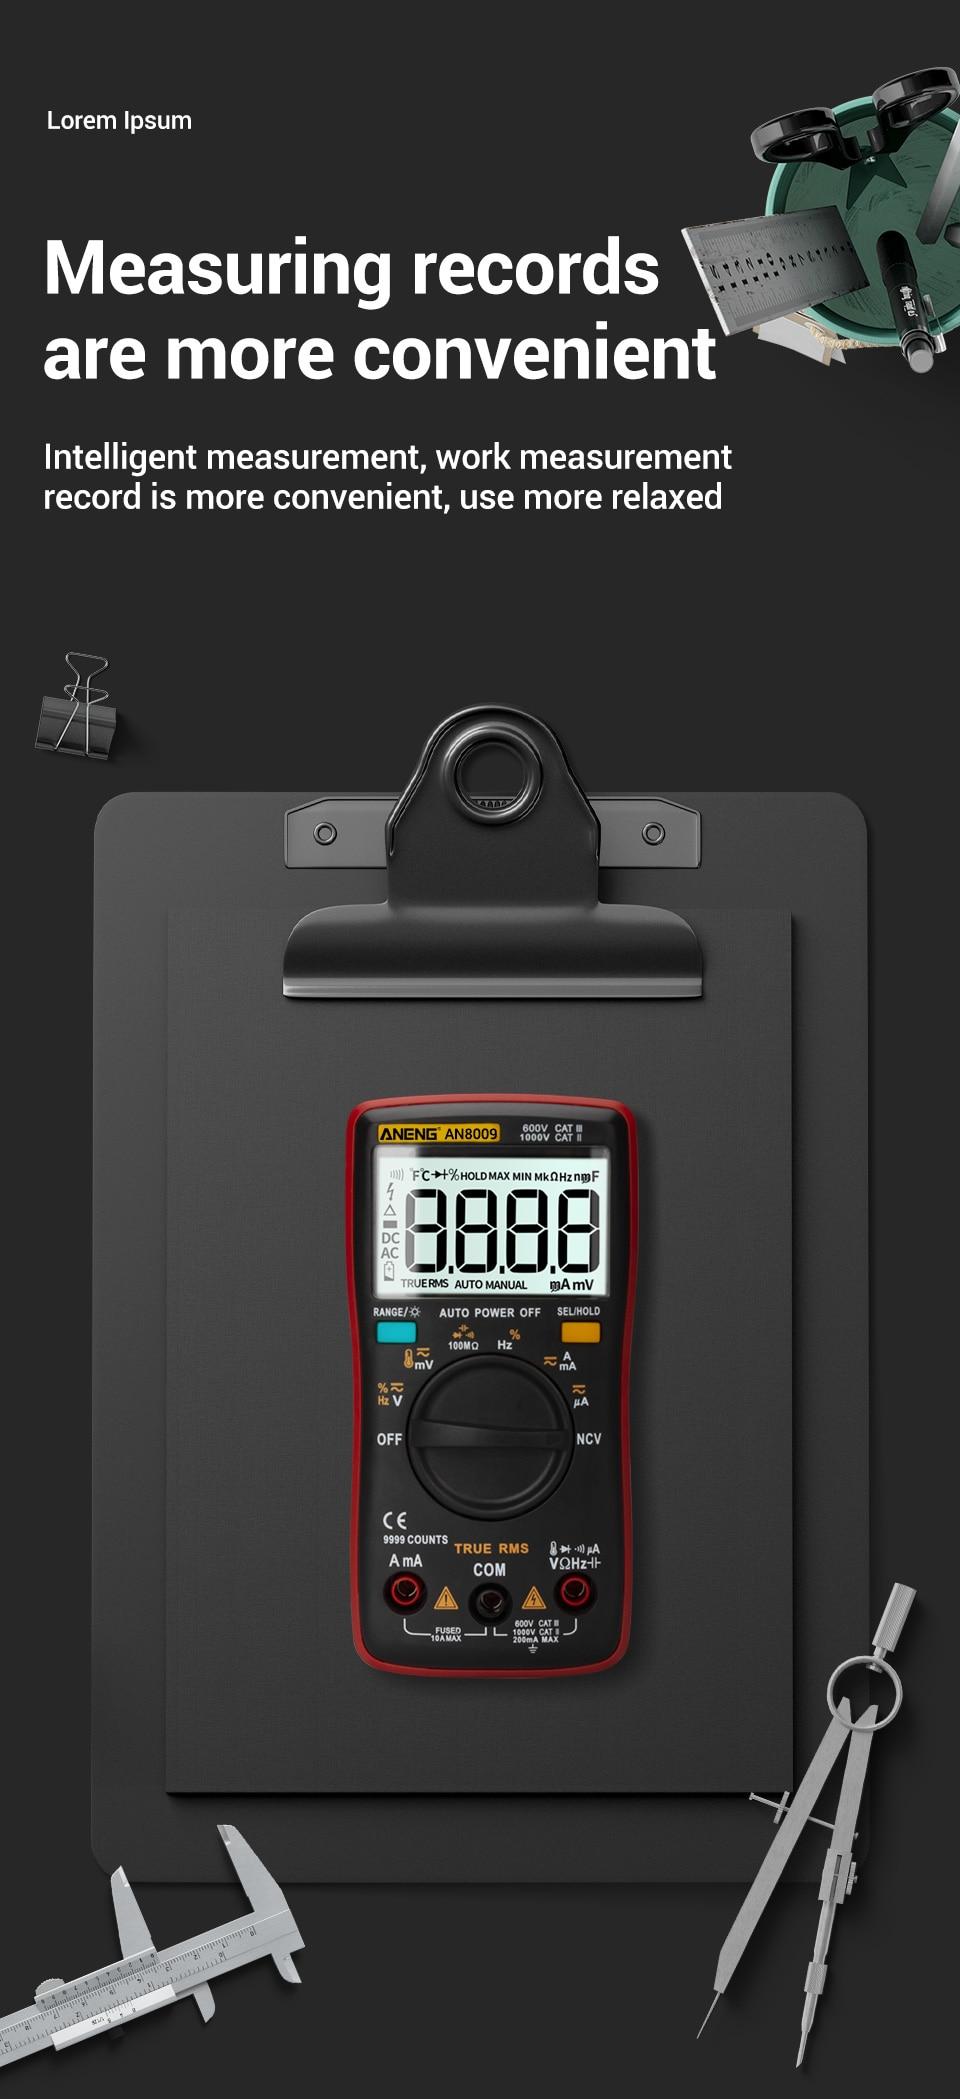 H5cacd15bcf5440cc89b7aa341a8b2b6aR ANENG AN8009 True-RMS Digital Multimeter transistor tester capacitor tester automotive electrical capacitance meter temp diode